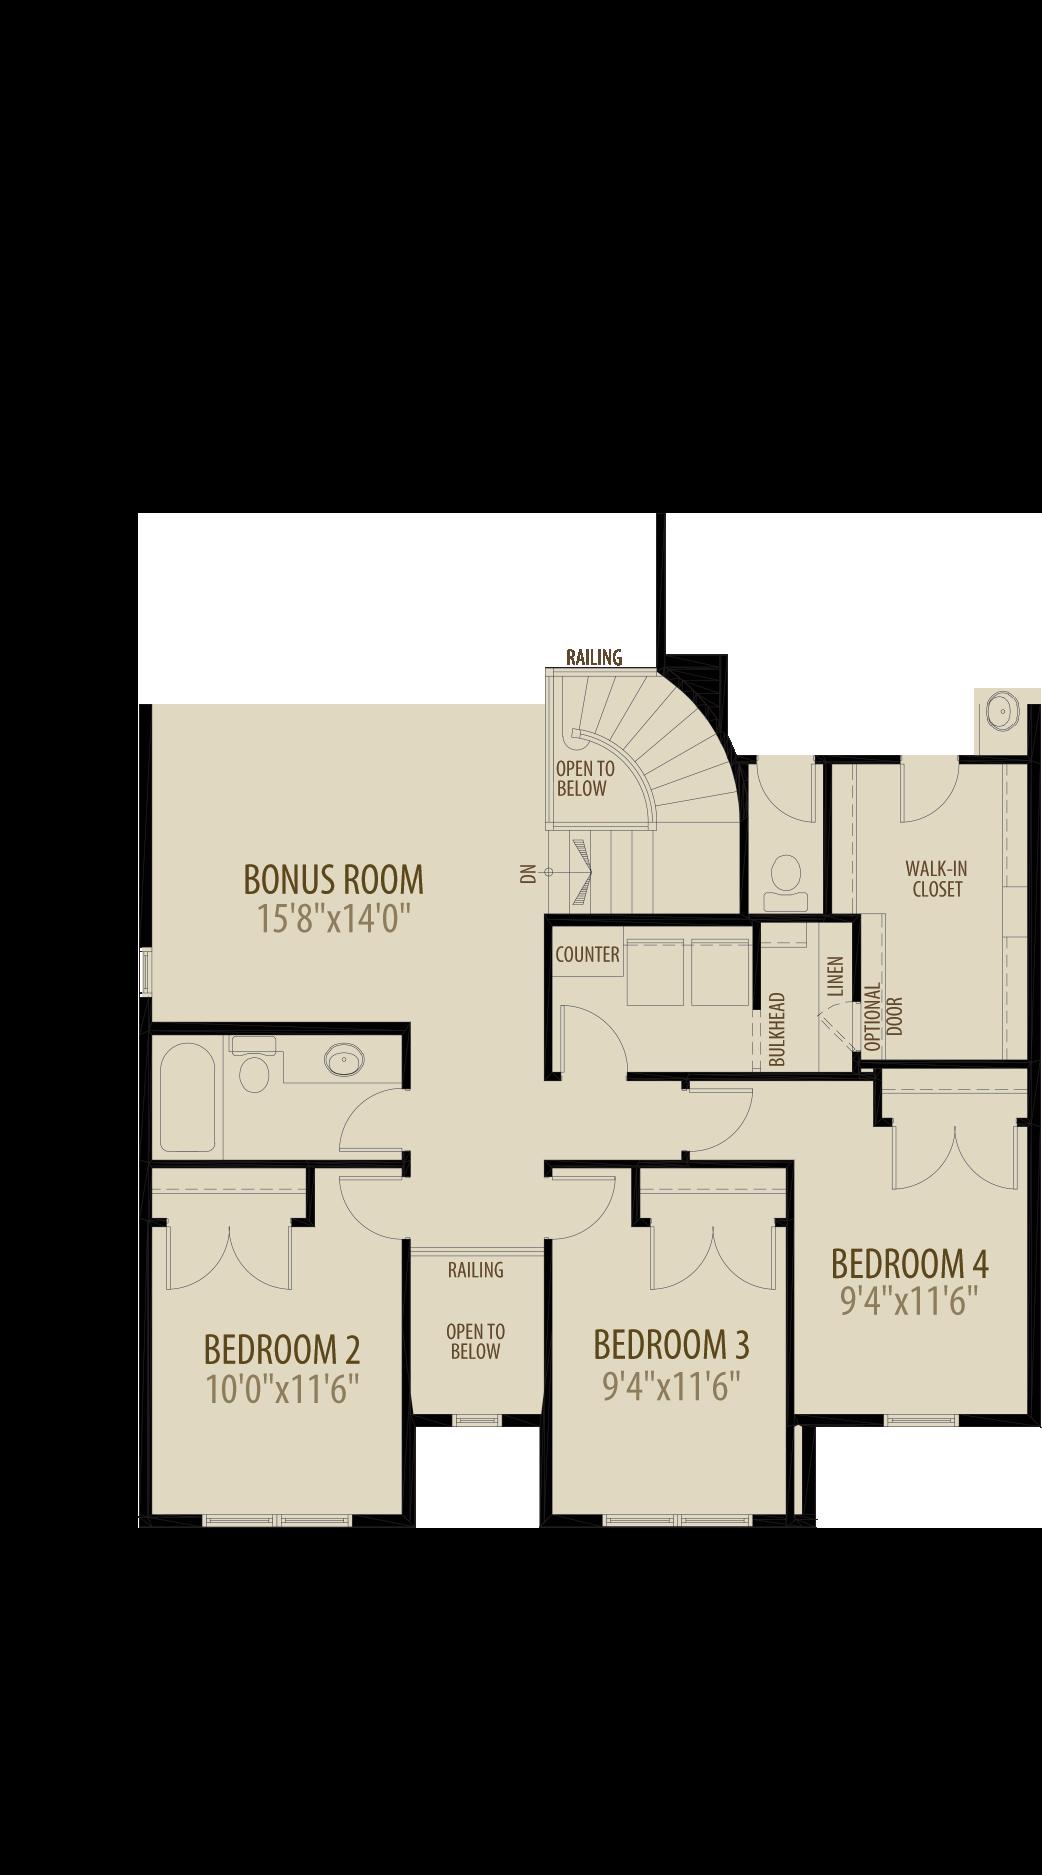 Option 3 4th Bedroom